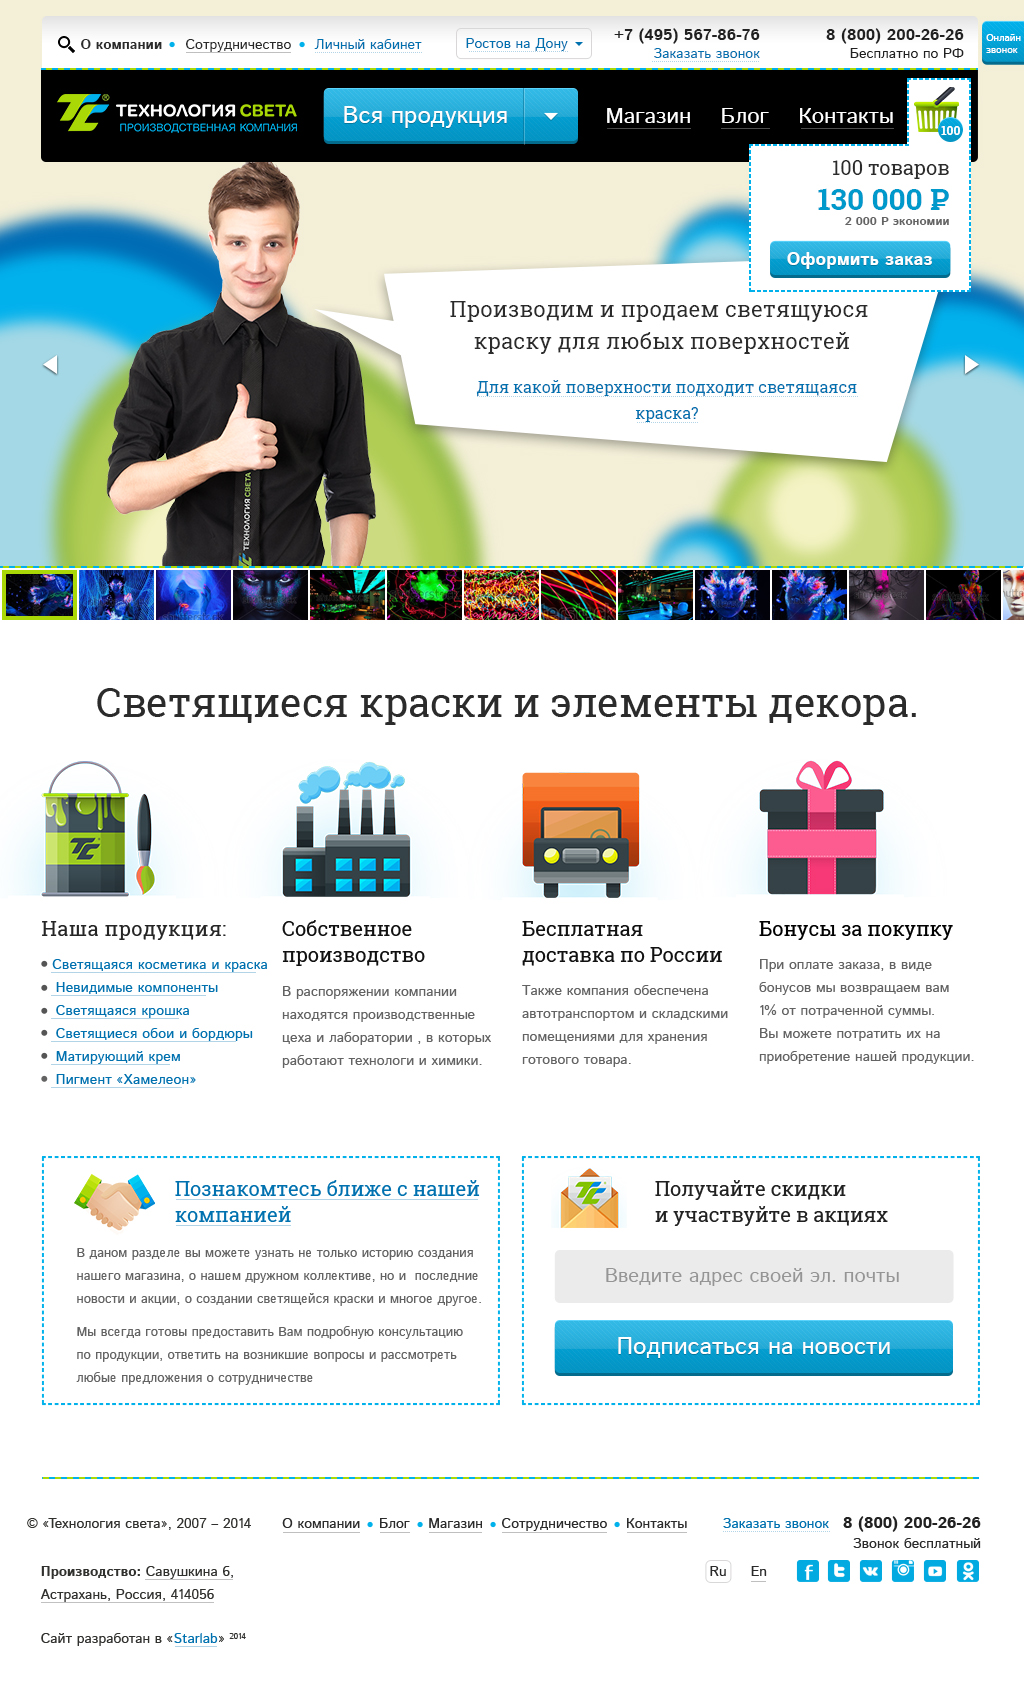 Интернет-магазин «Технология света»